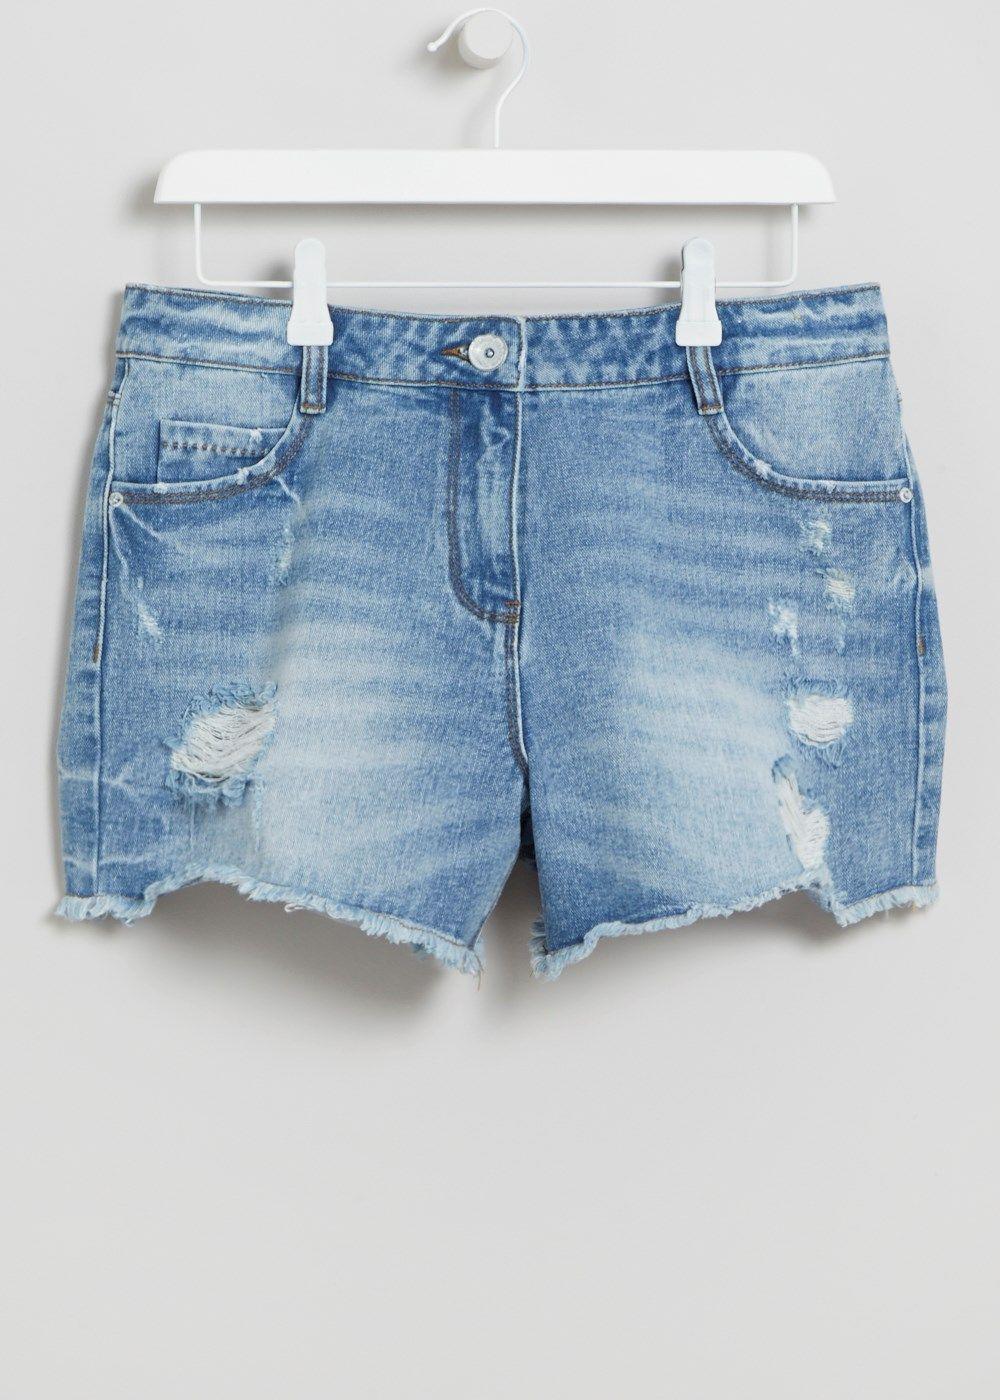 d7158b0a9f Falmer High Waisted Shorts - Matalan   Holiday shop   Short waist ...